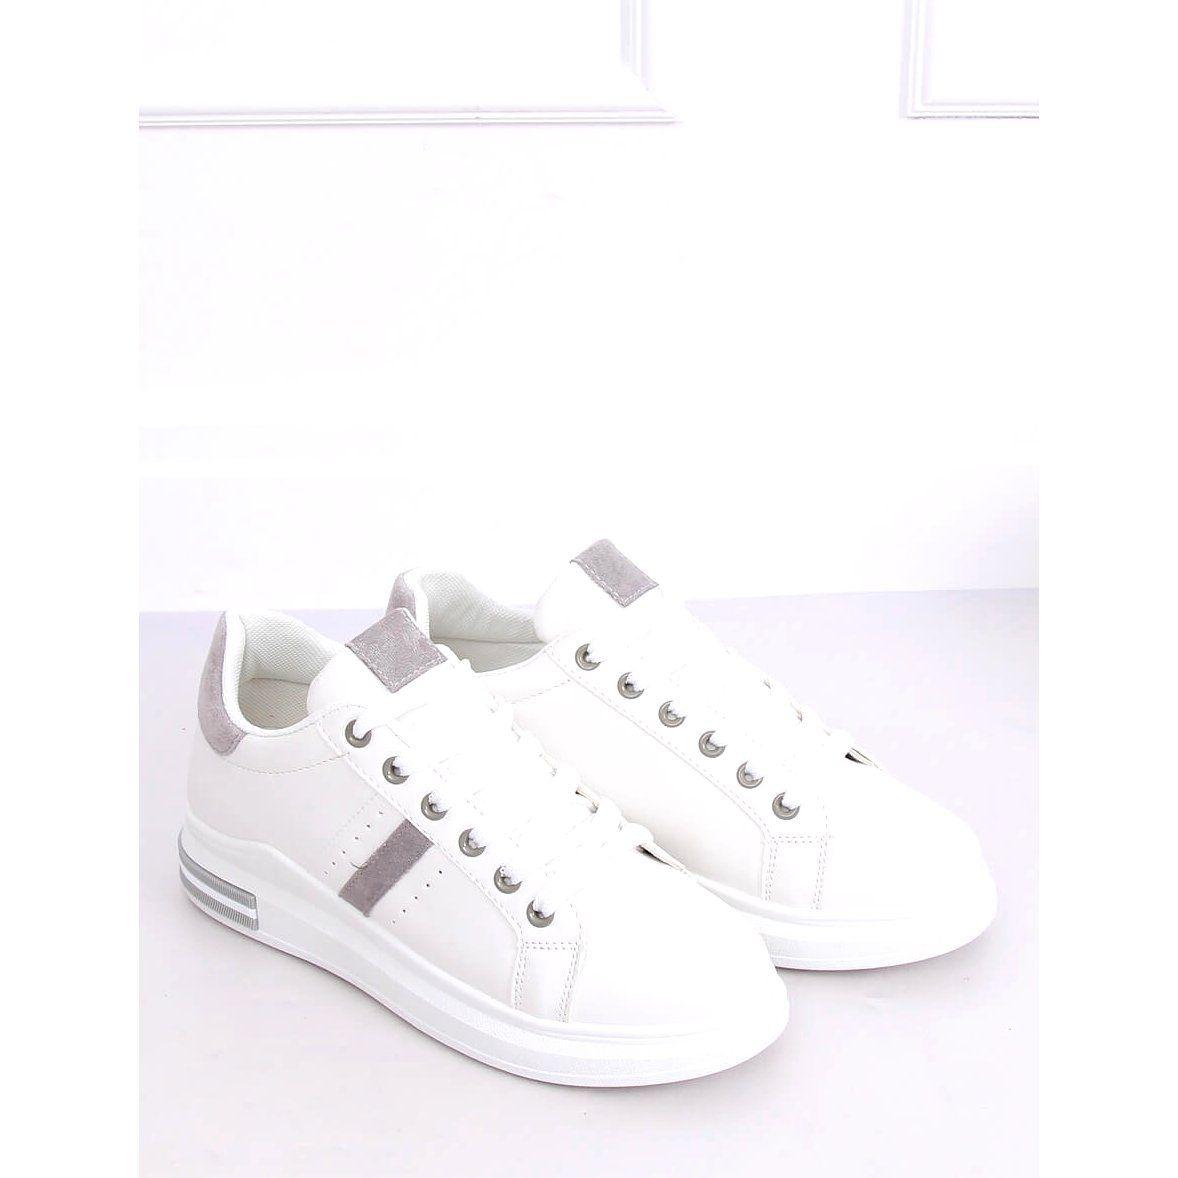 Buty Sportowe Damskie Biale Bl201p Grey White Sneaker Shoes Sneakers